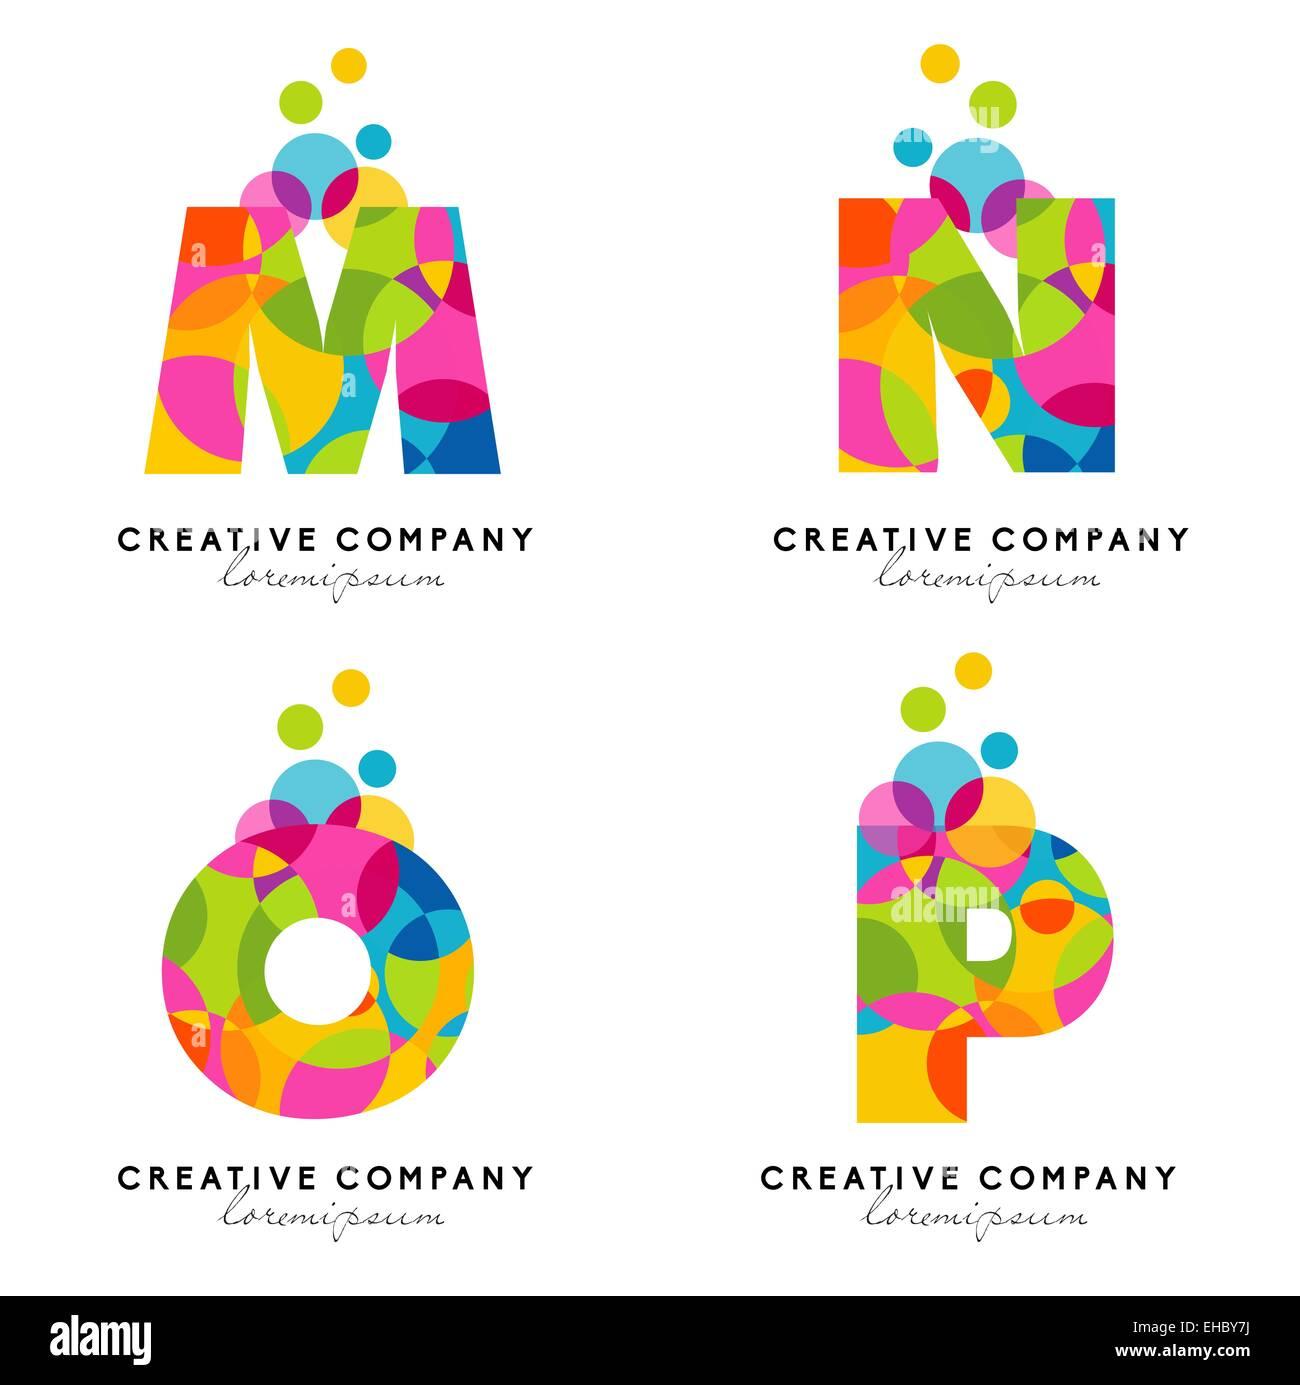 Alphabet Letters Design Stock Photos Alphabet Letters Design Stock